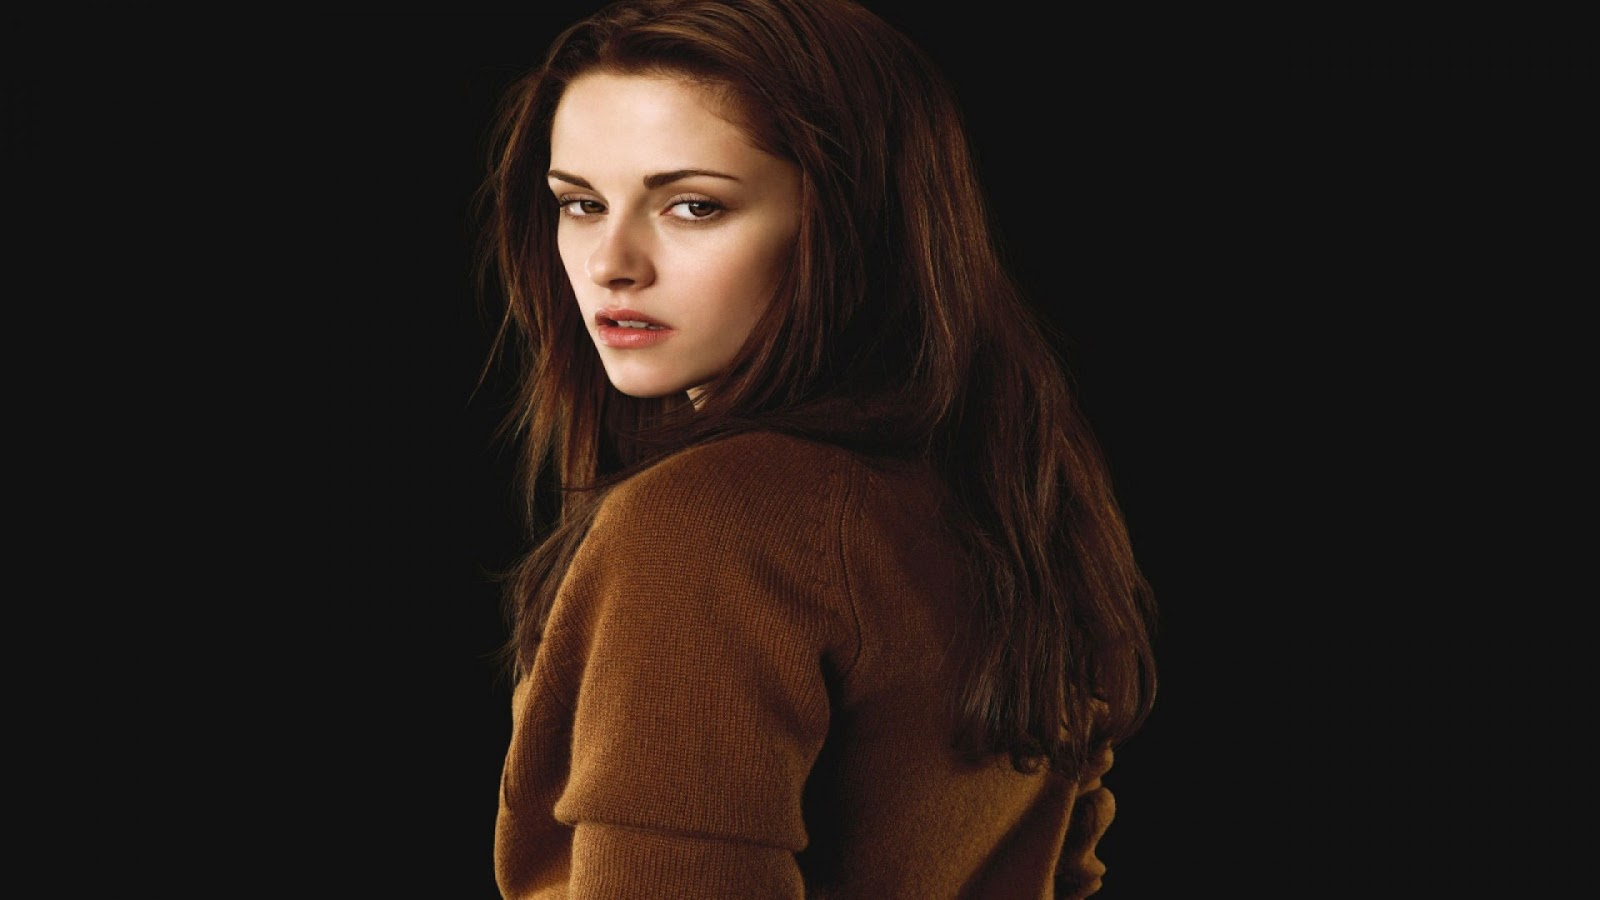 kristen stewart hollywood actress - photo #7